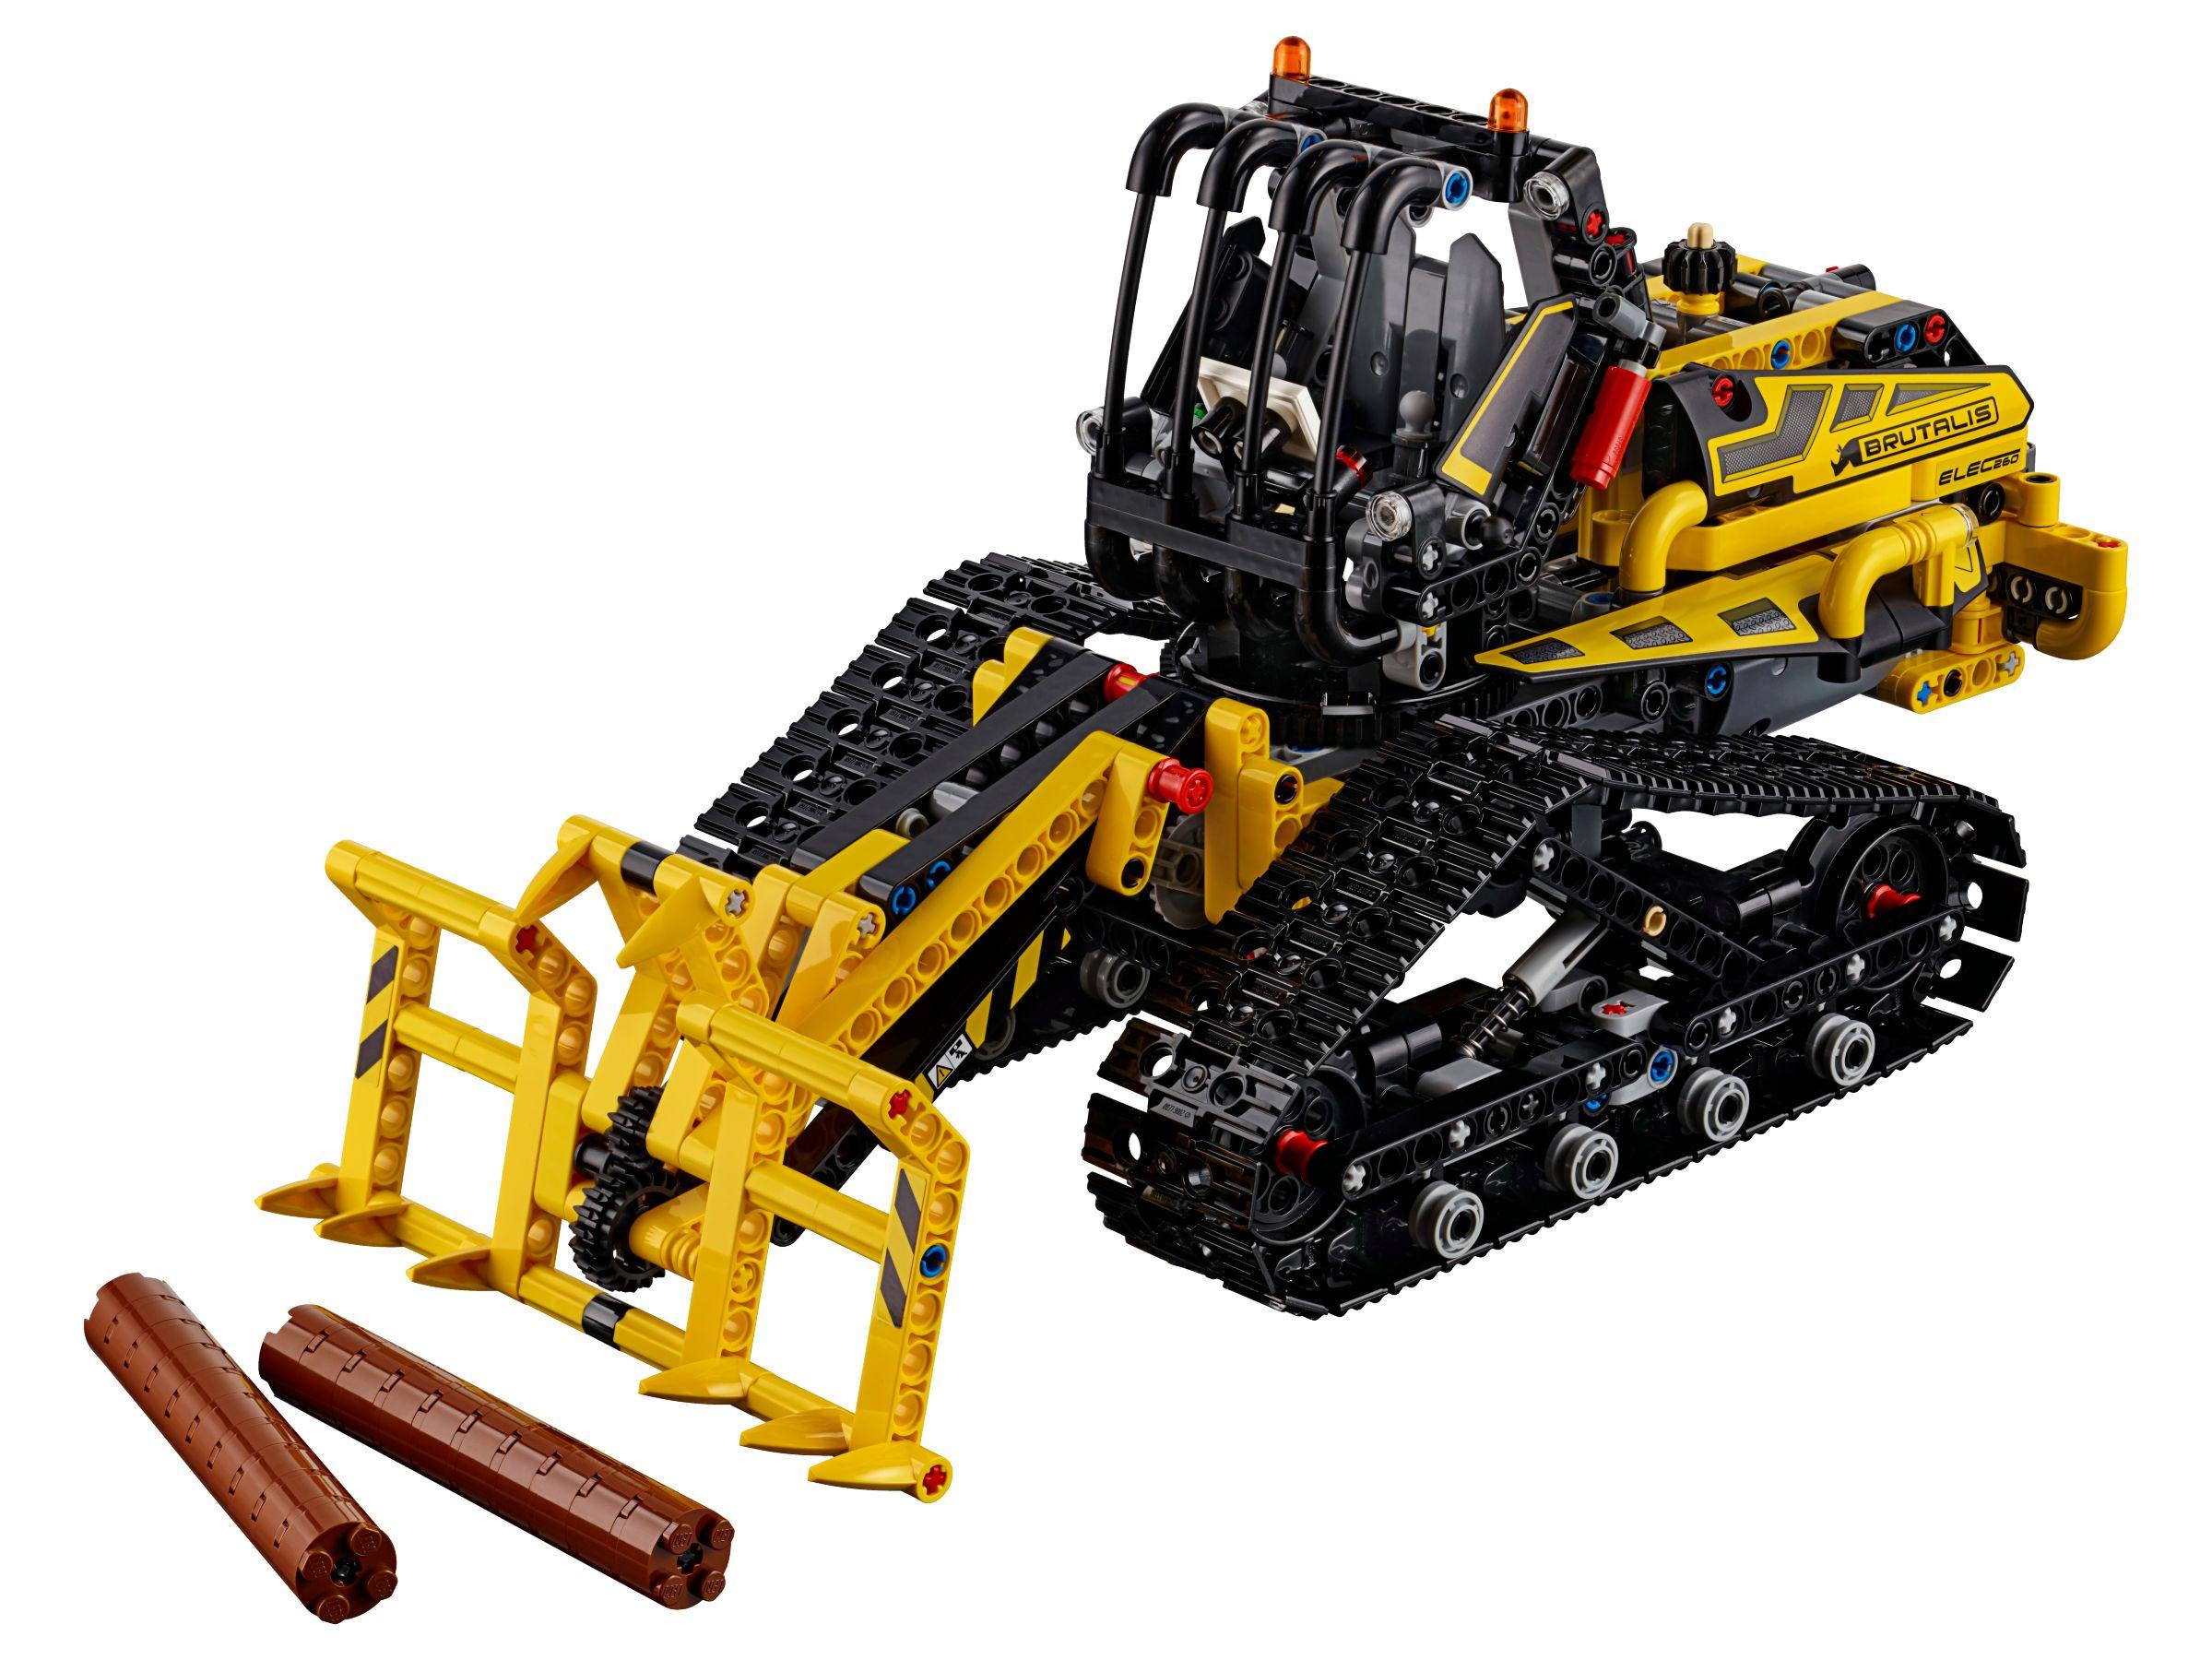 lego technic 42094 raupenlader ab 39 99 33 gespart. Black Bedroom Furniture Sets. Home Design Ideas